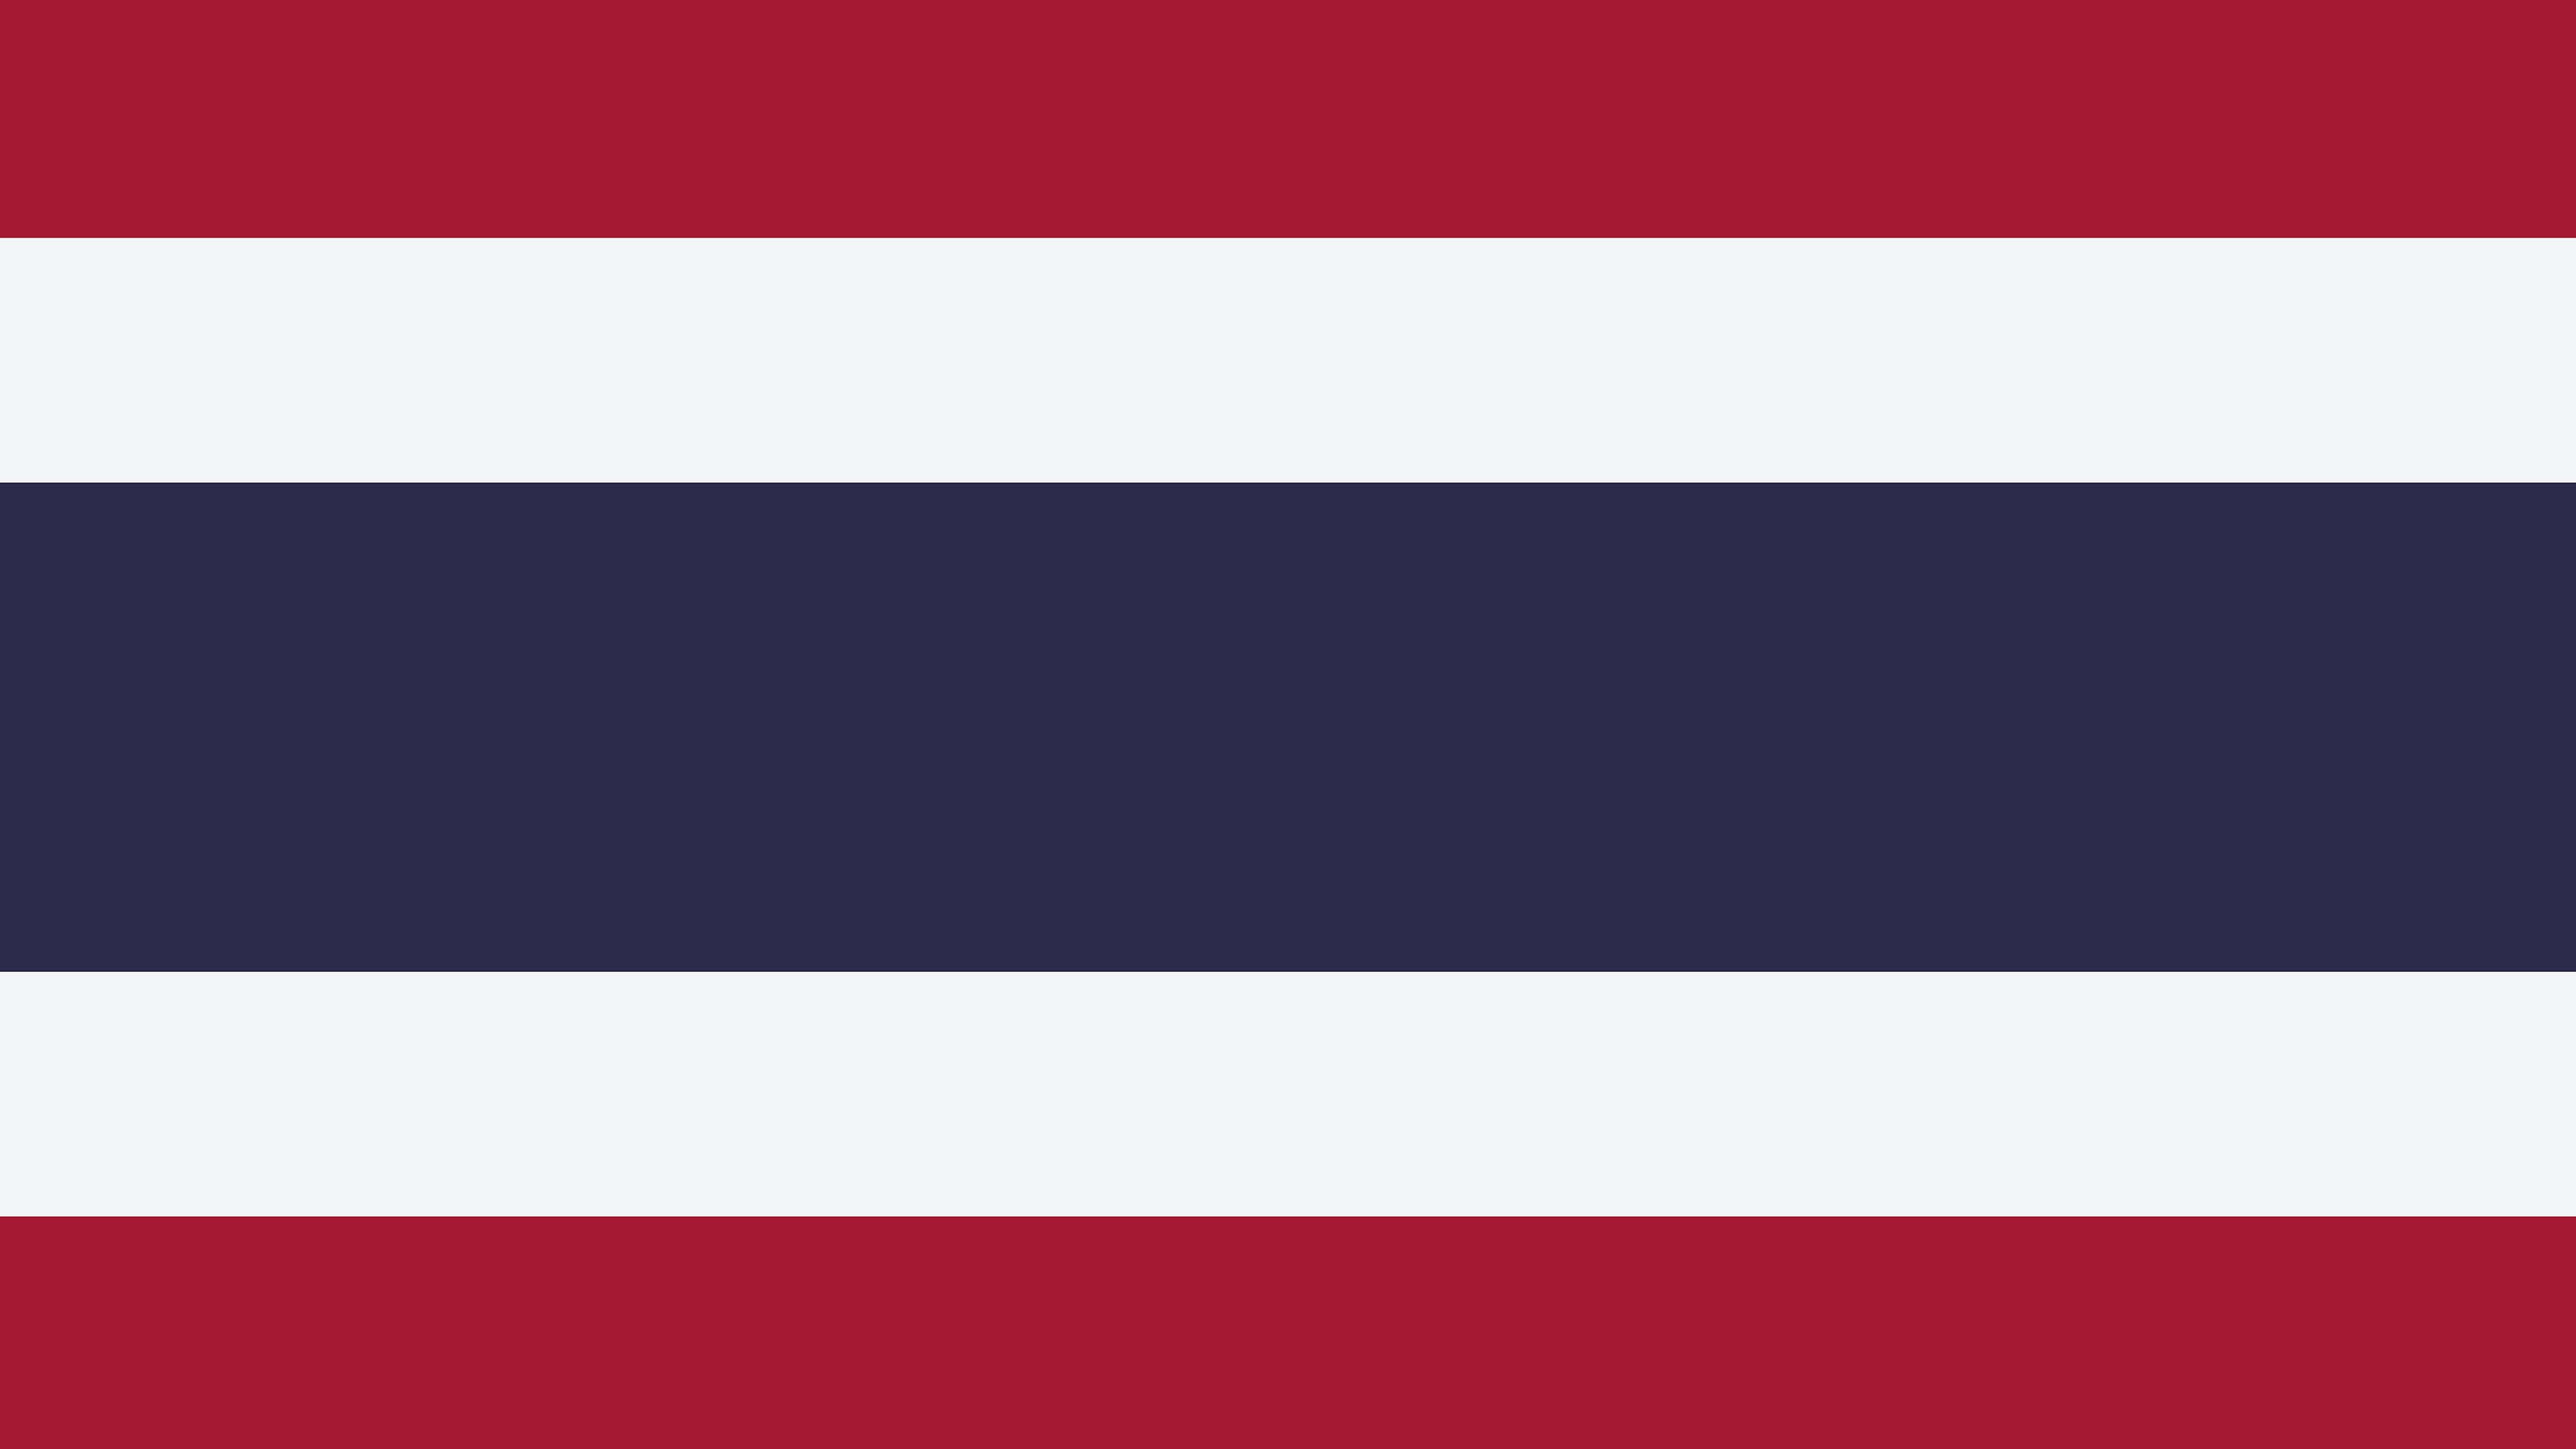 thailand flag uhd 4k wallpaper